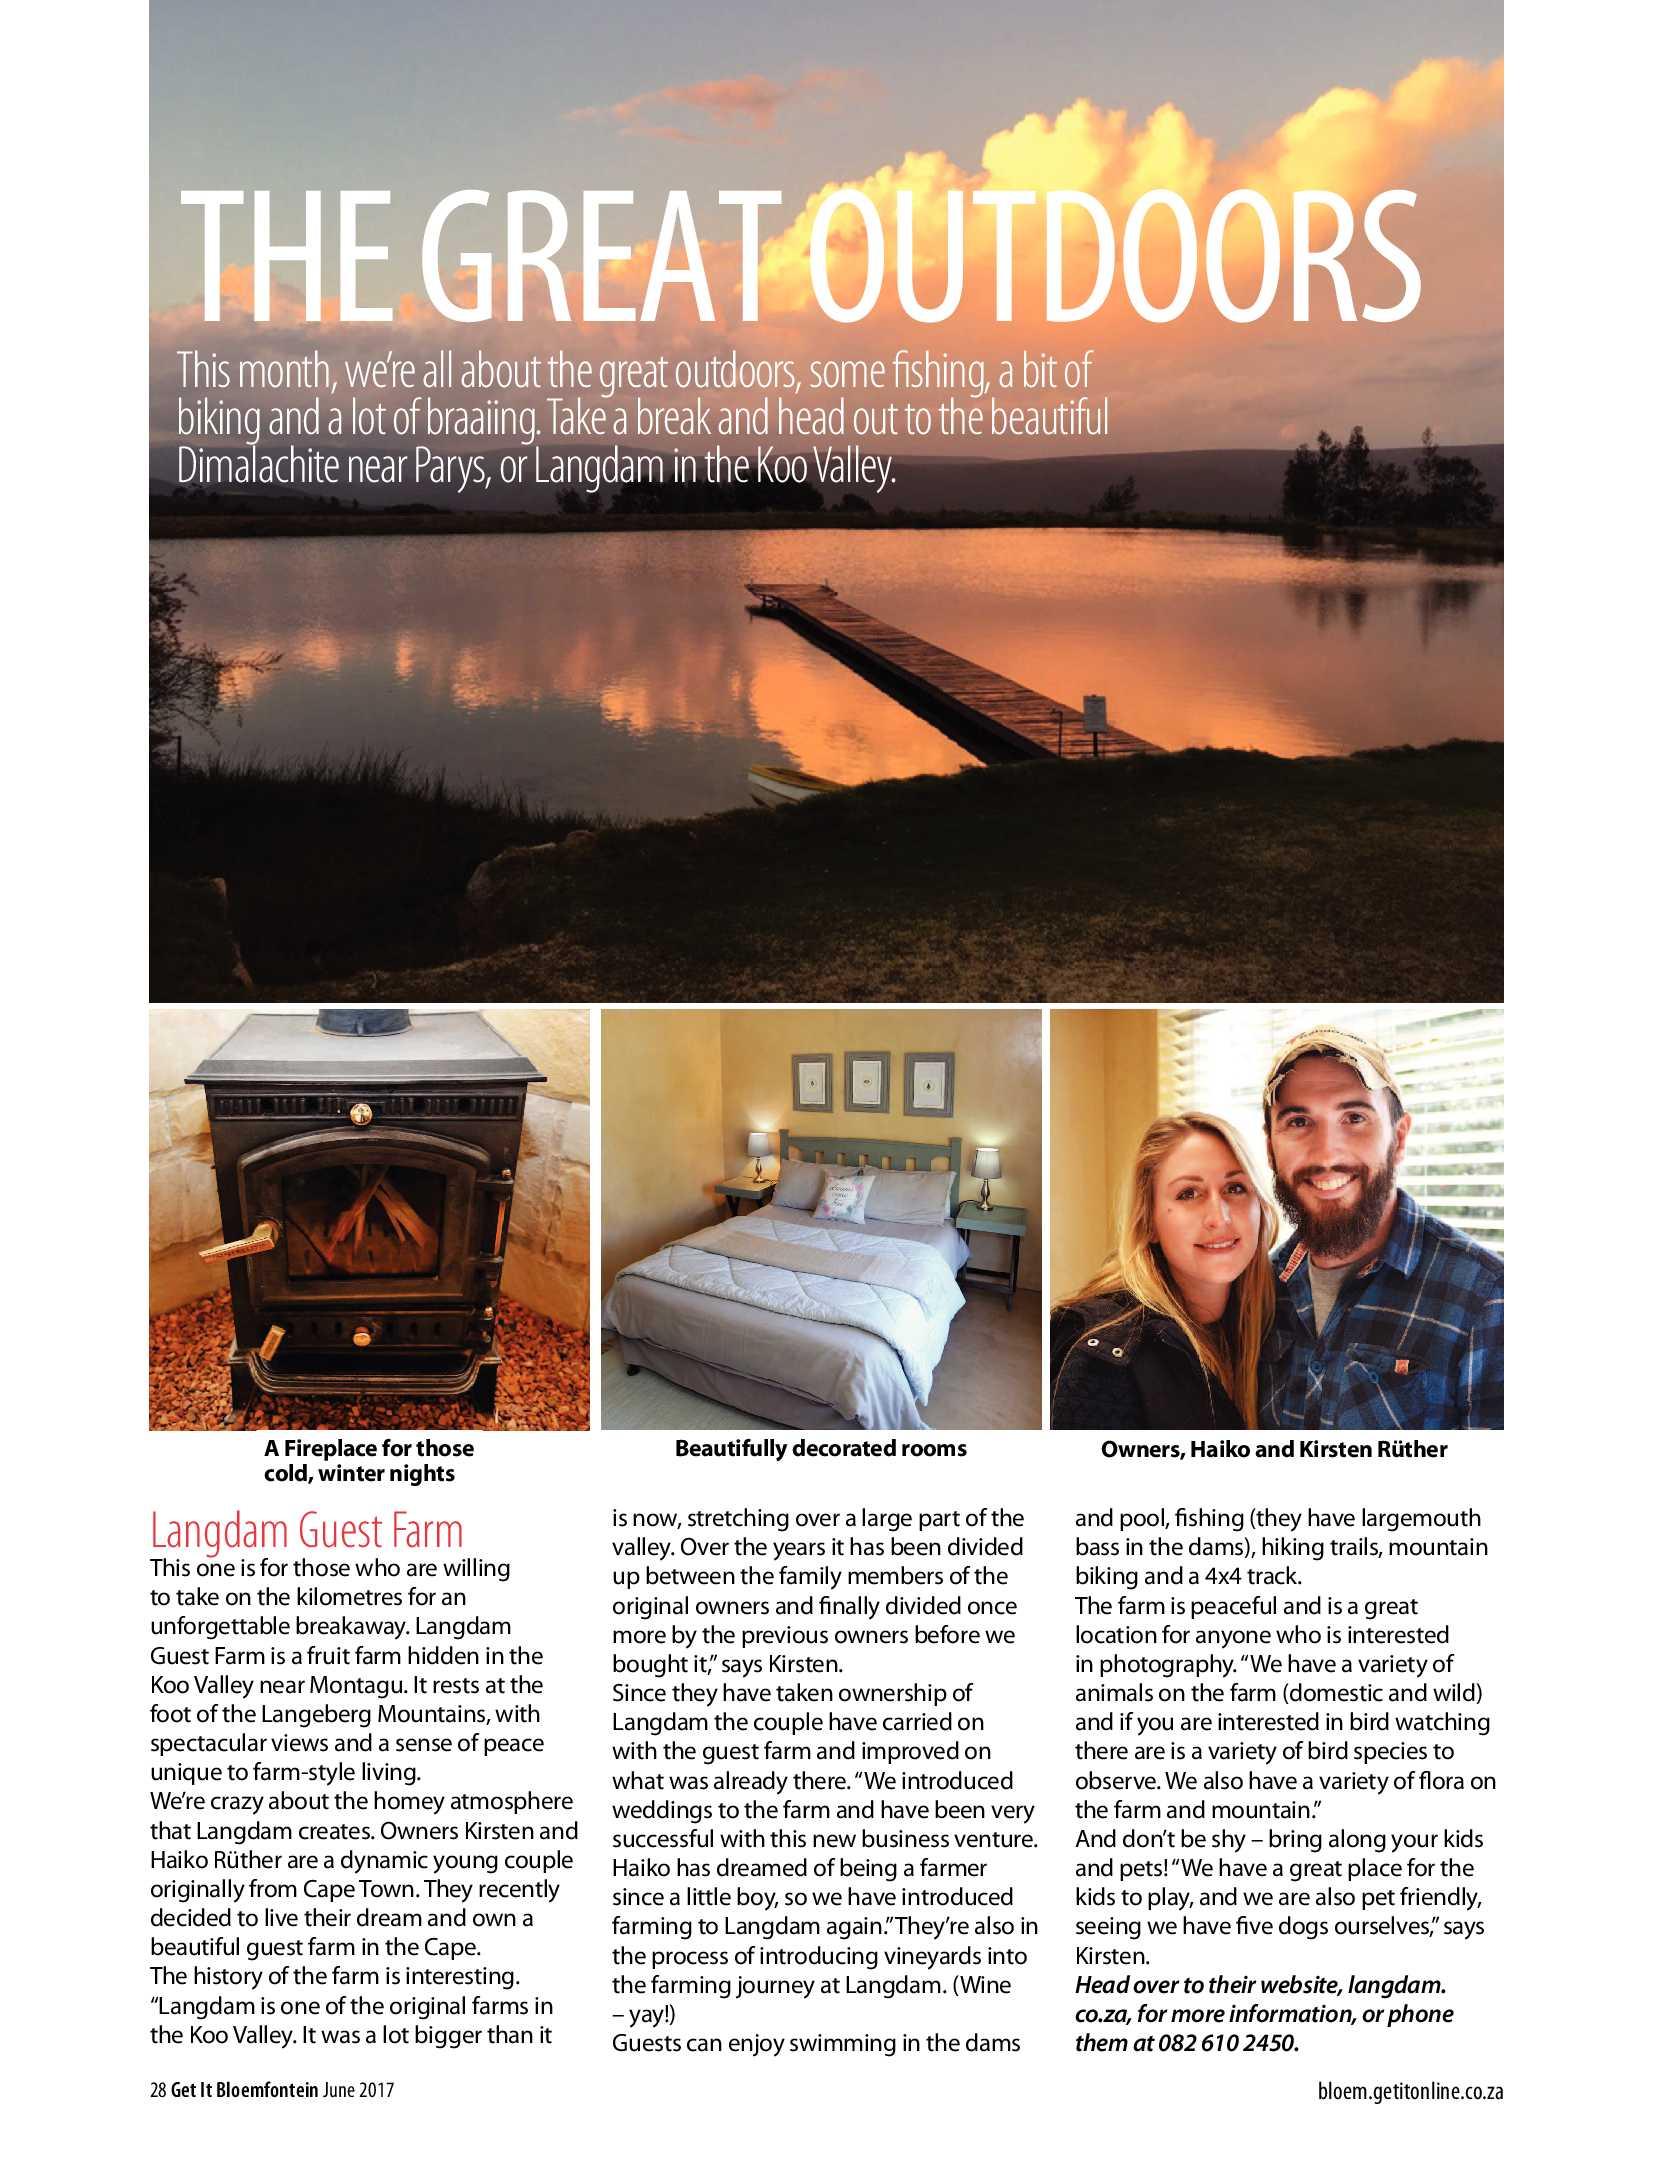 get-bloemfontein-june-2017-epapers-page-30